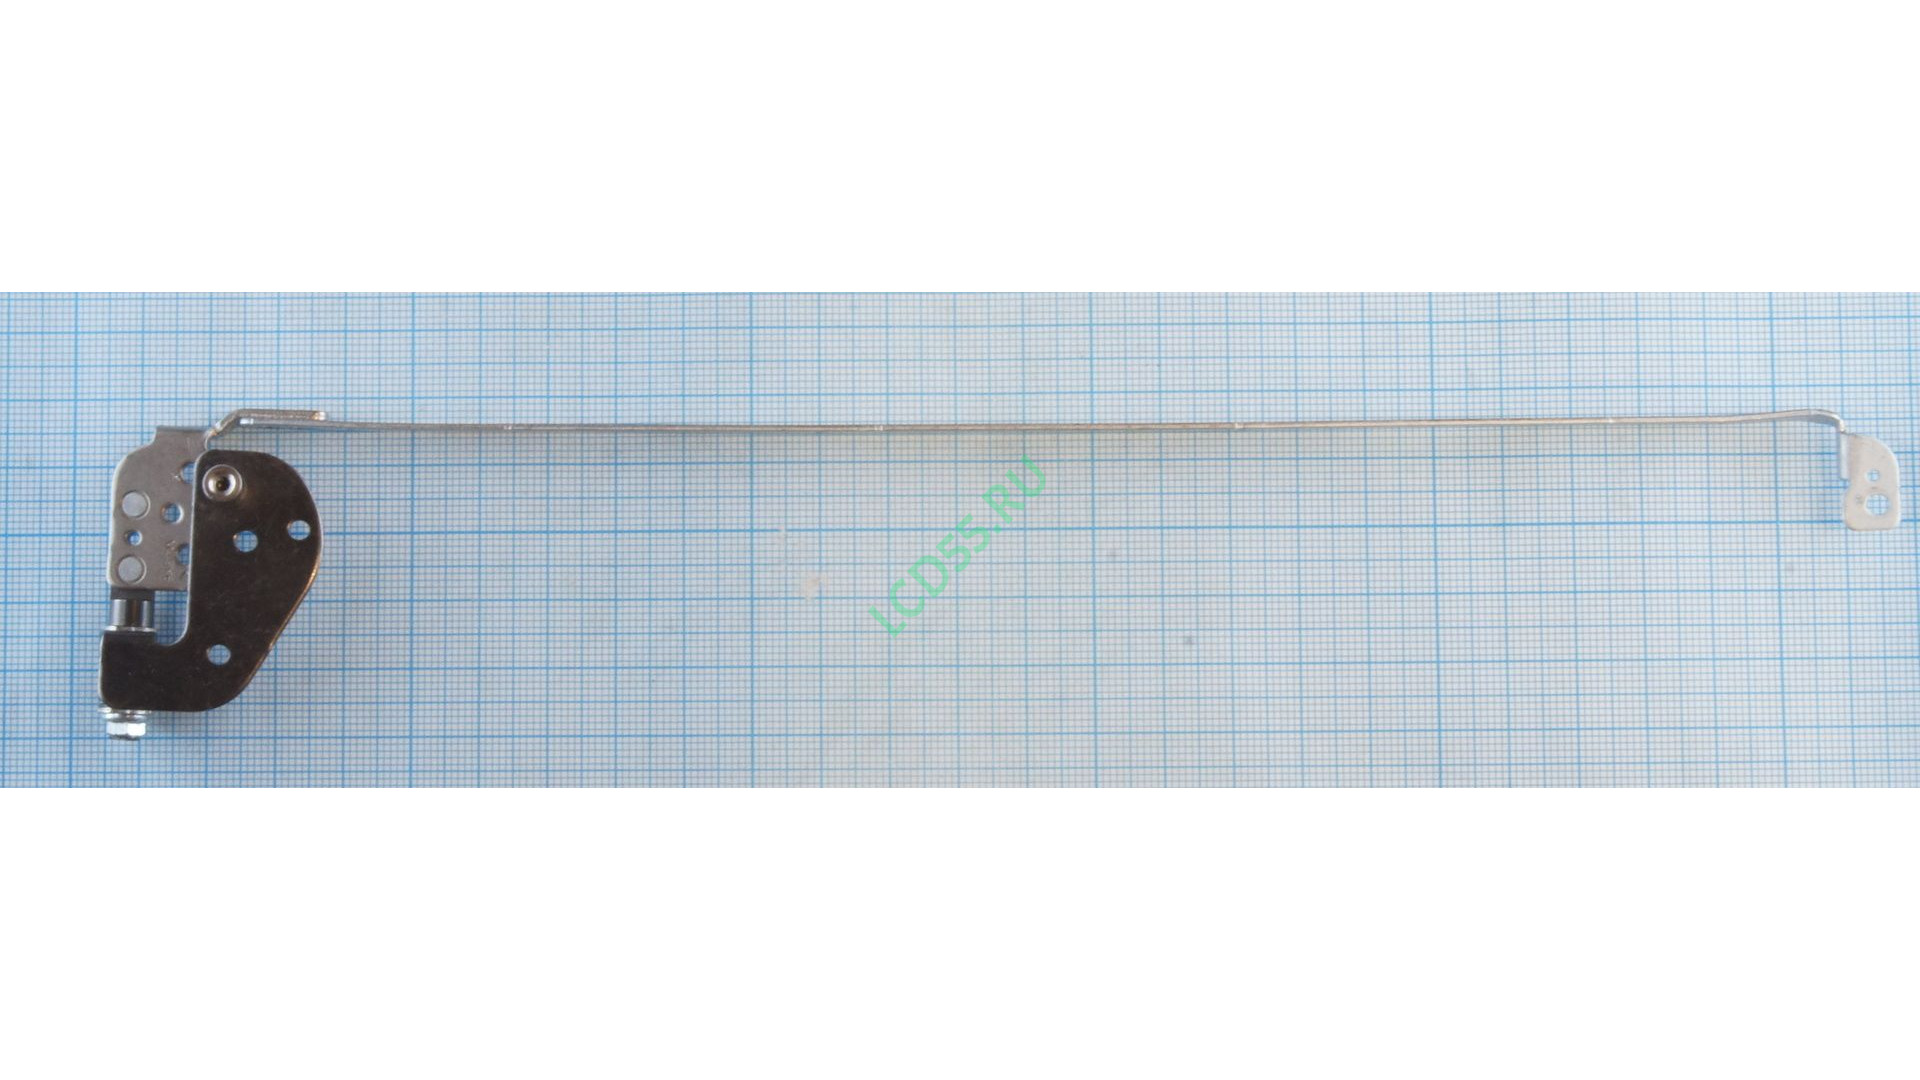 Петля левая Acer Aspire 7715 (AM06X000110, AM06X000110)